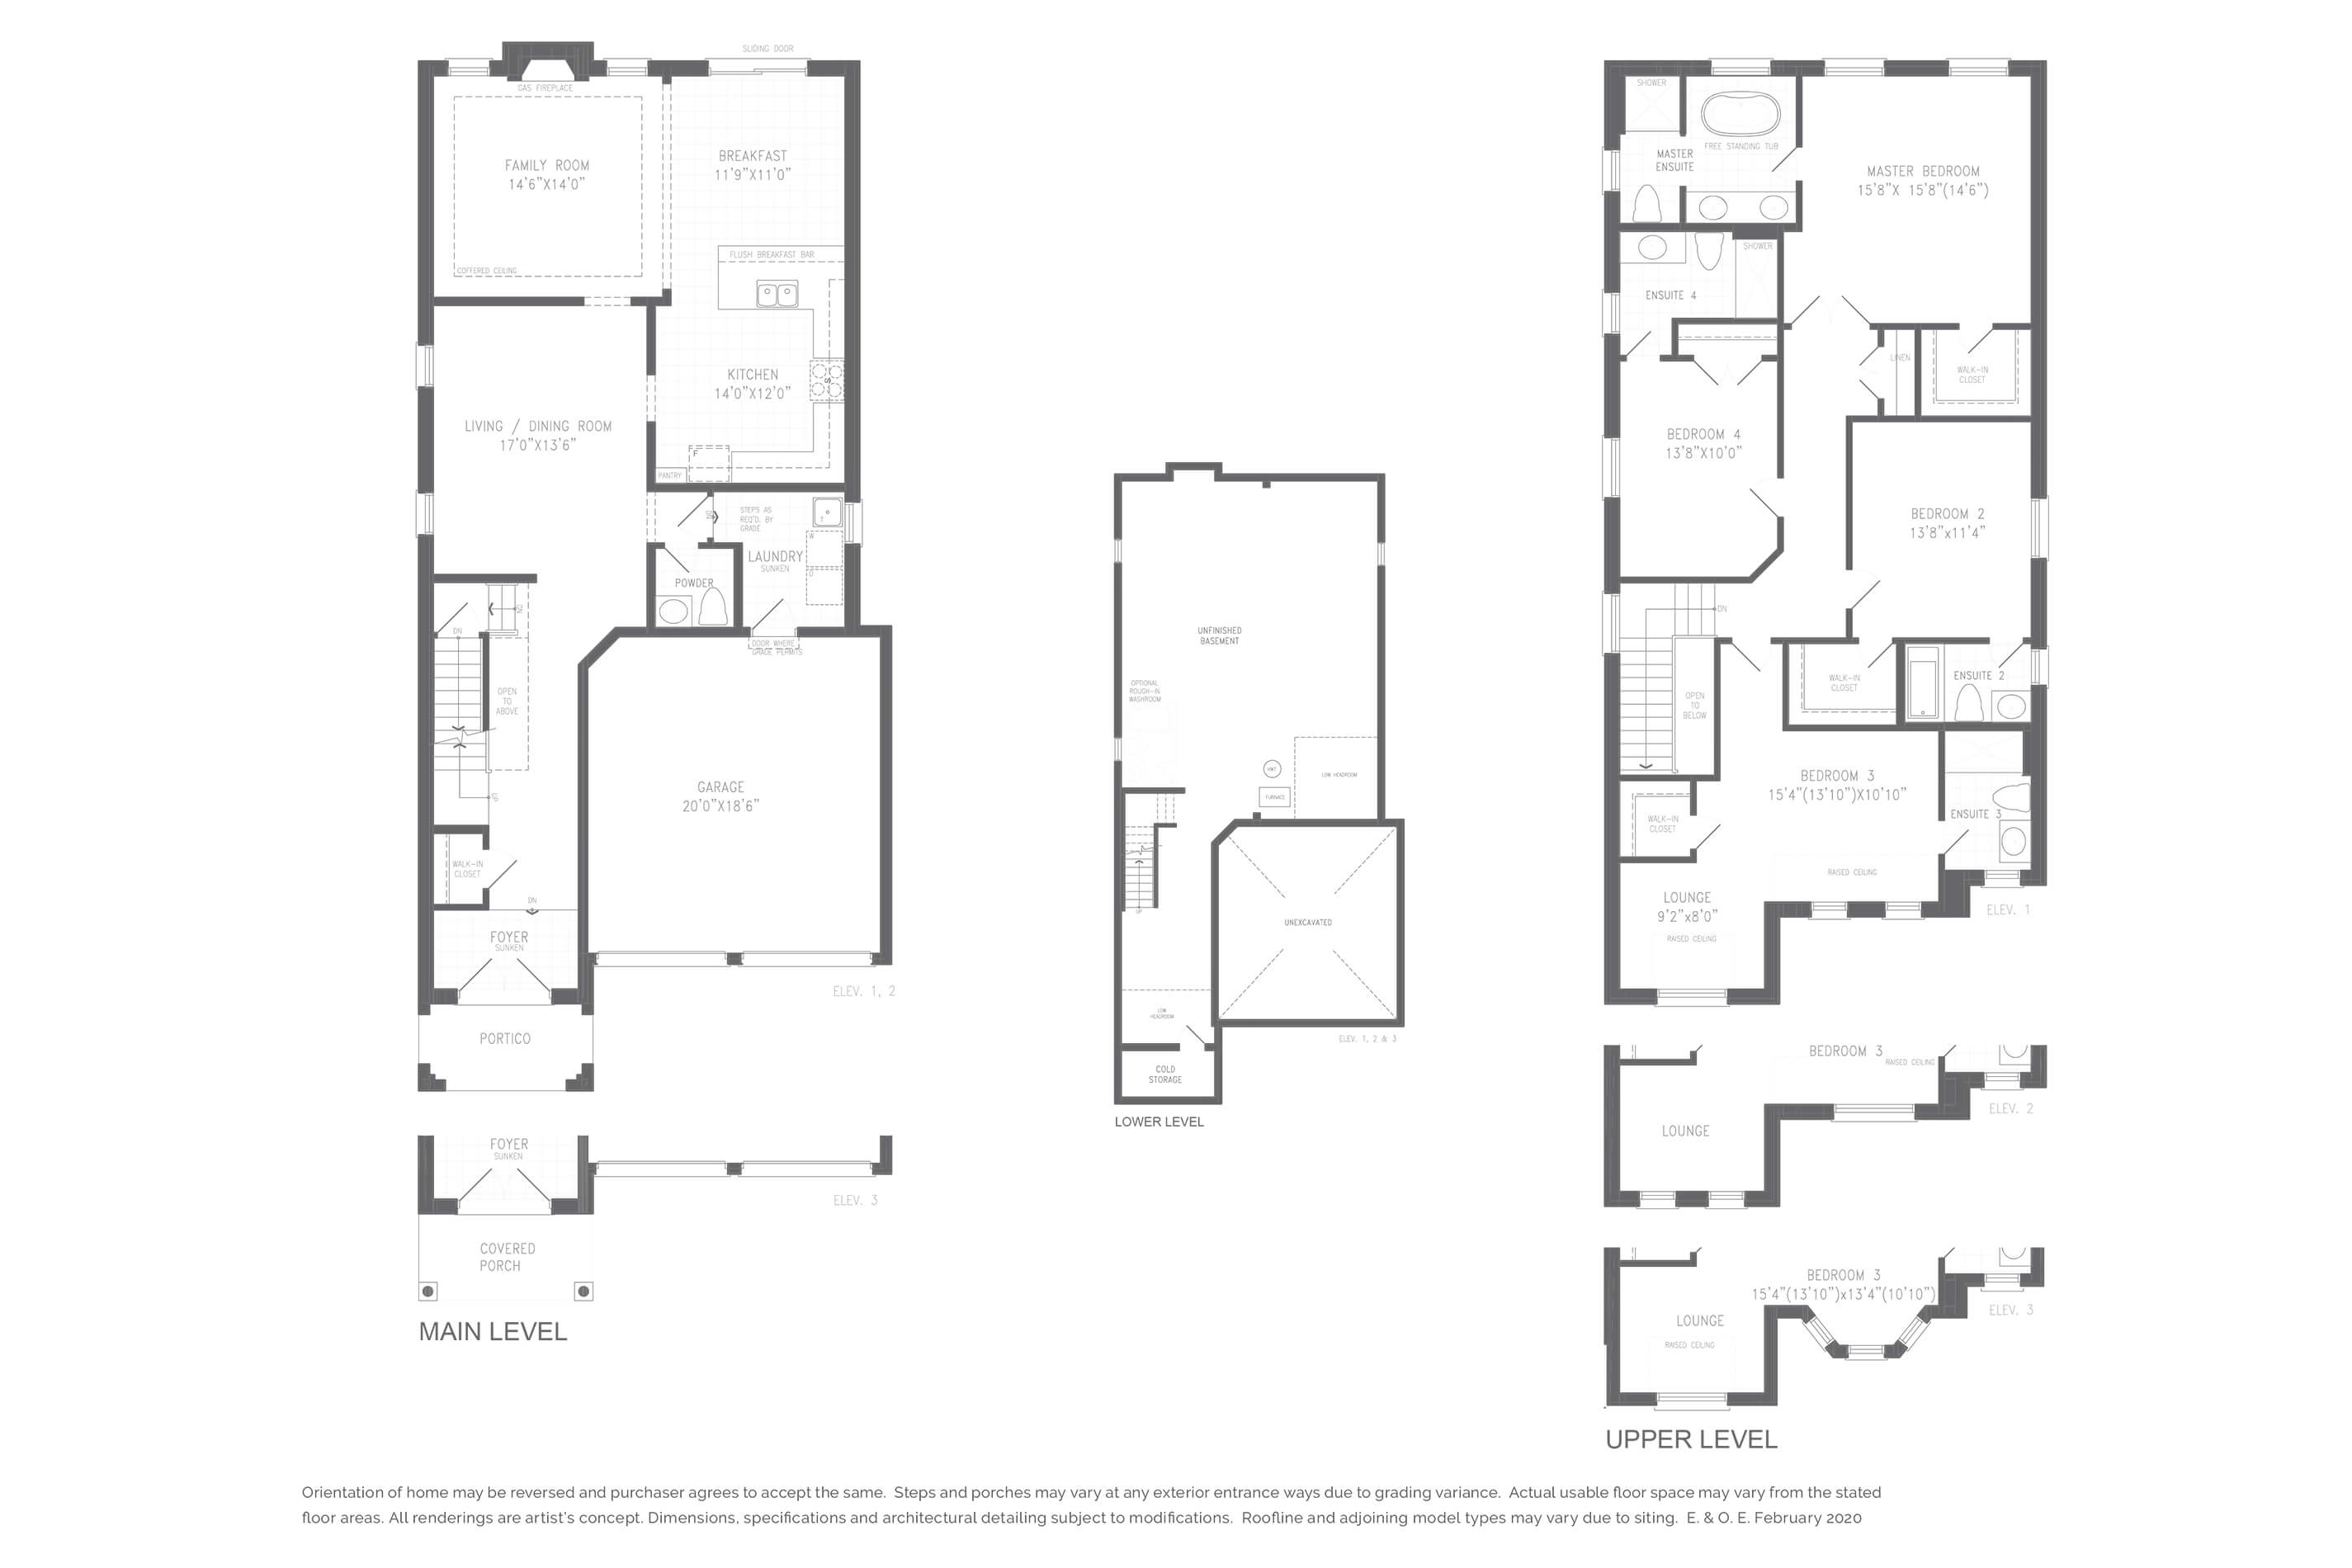 Brentwood 3 Floorplan